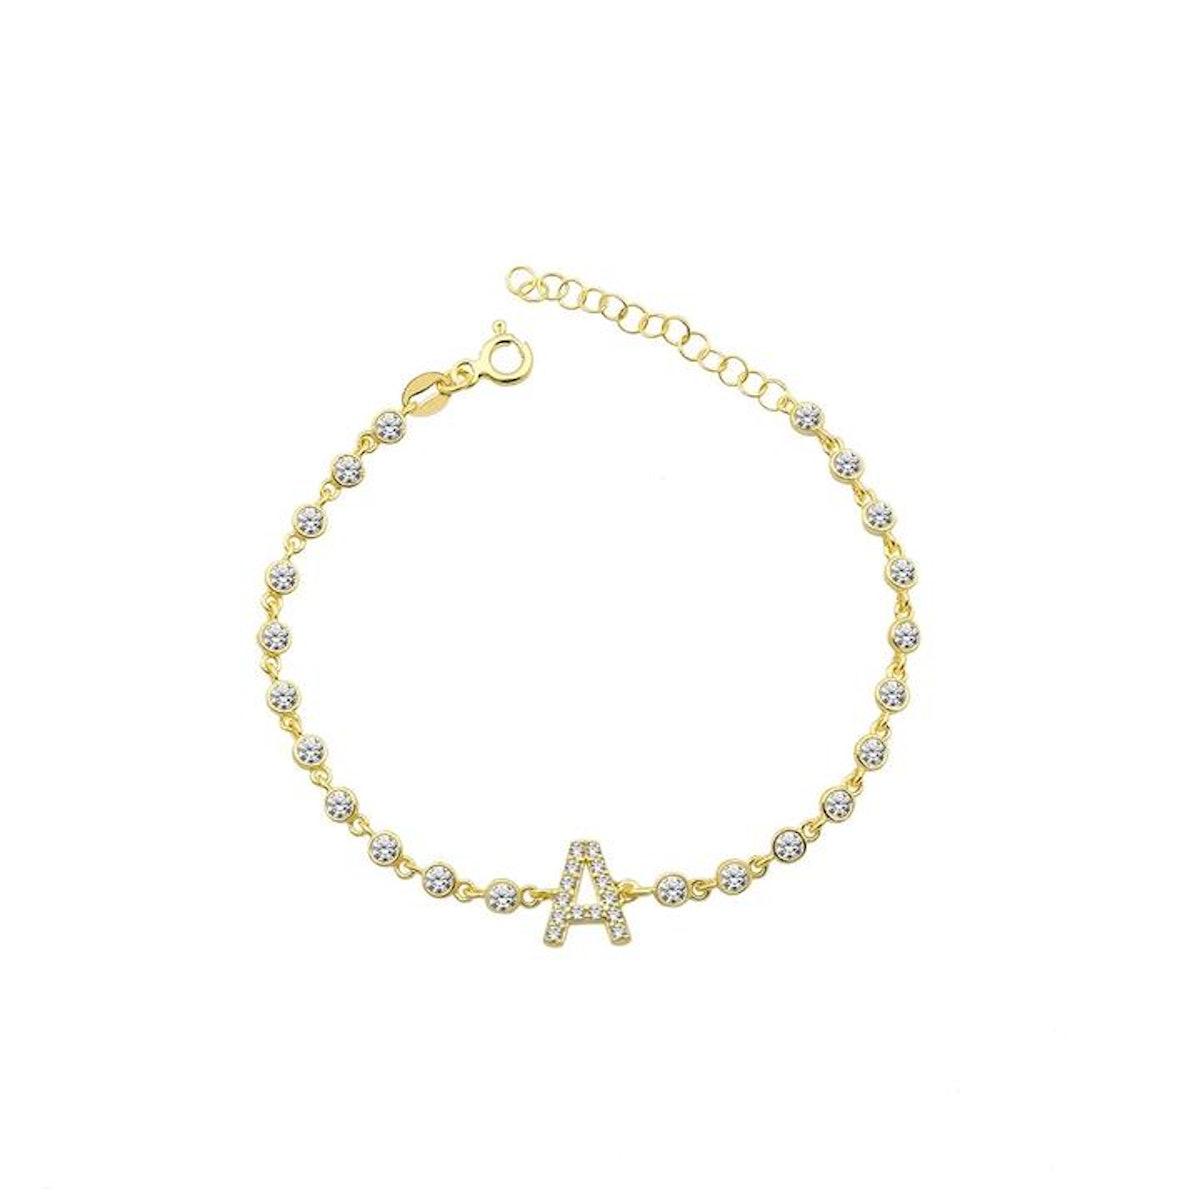 The Sis Kiss Crystal Single Letter Initial Bracelet